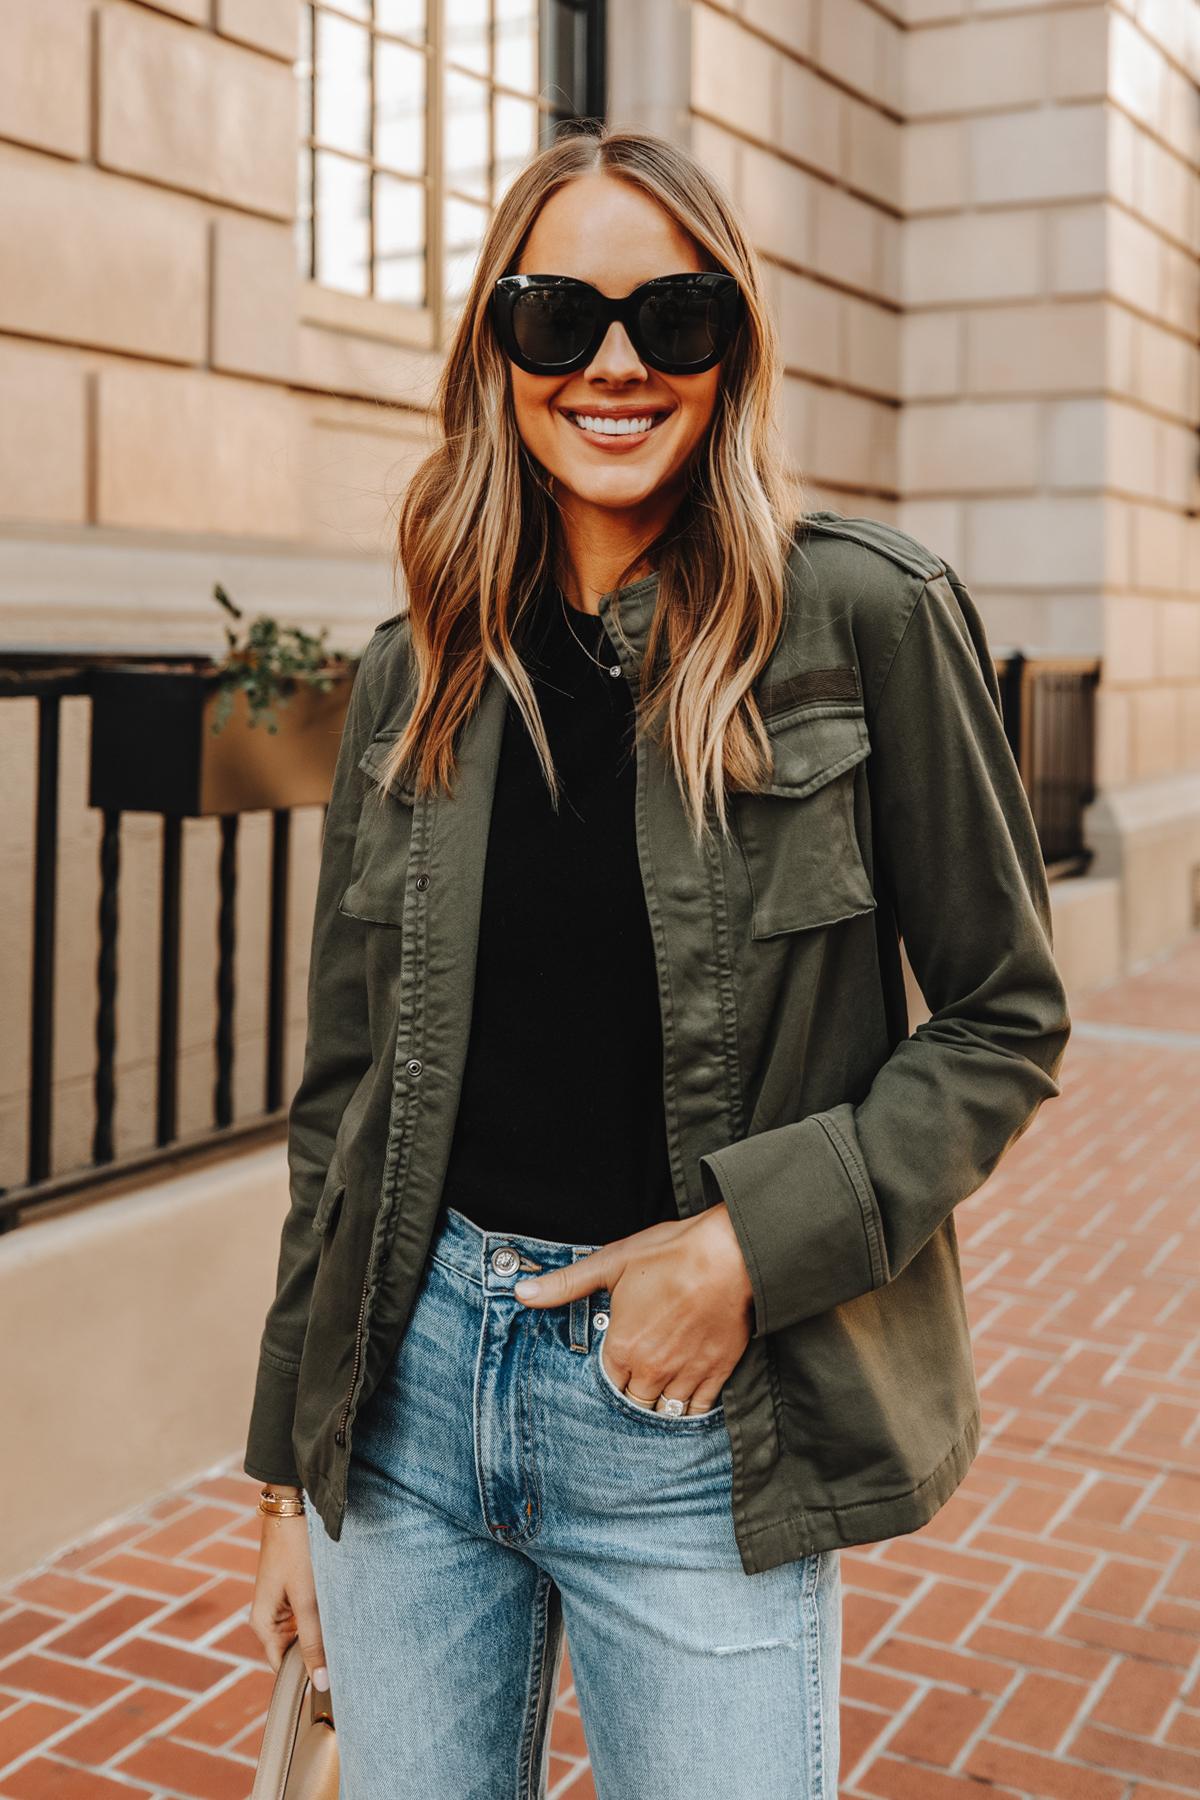 Fashion Jackson Wearing Anine Bing Army Jacket Black Tshirt Blue Jeans Outfit 1